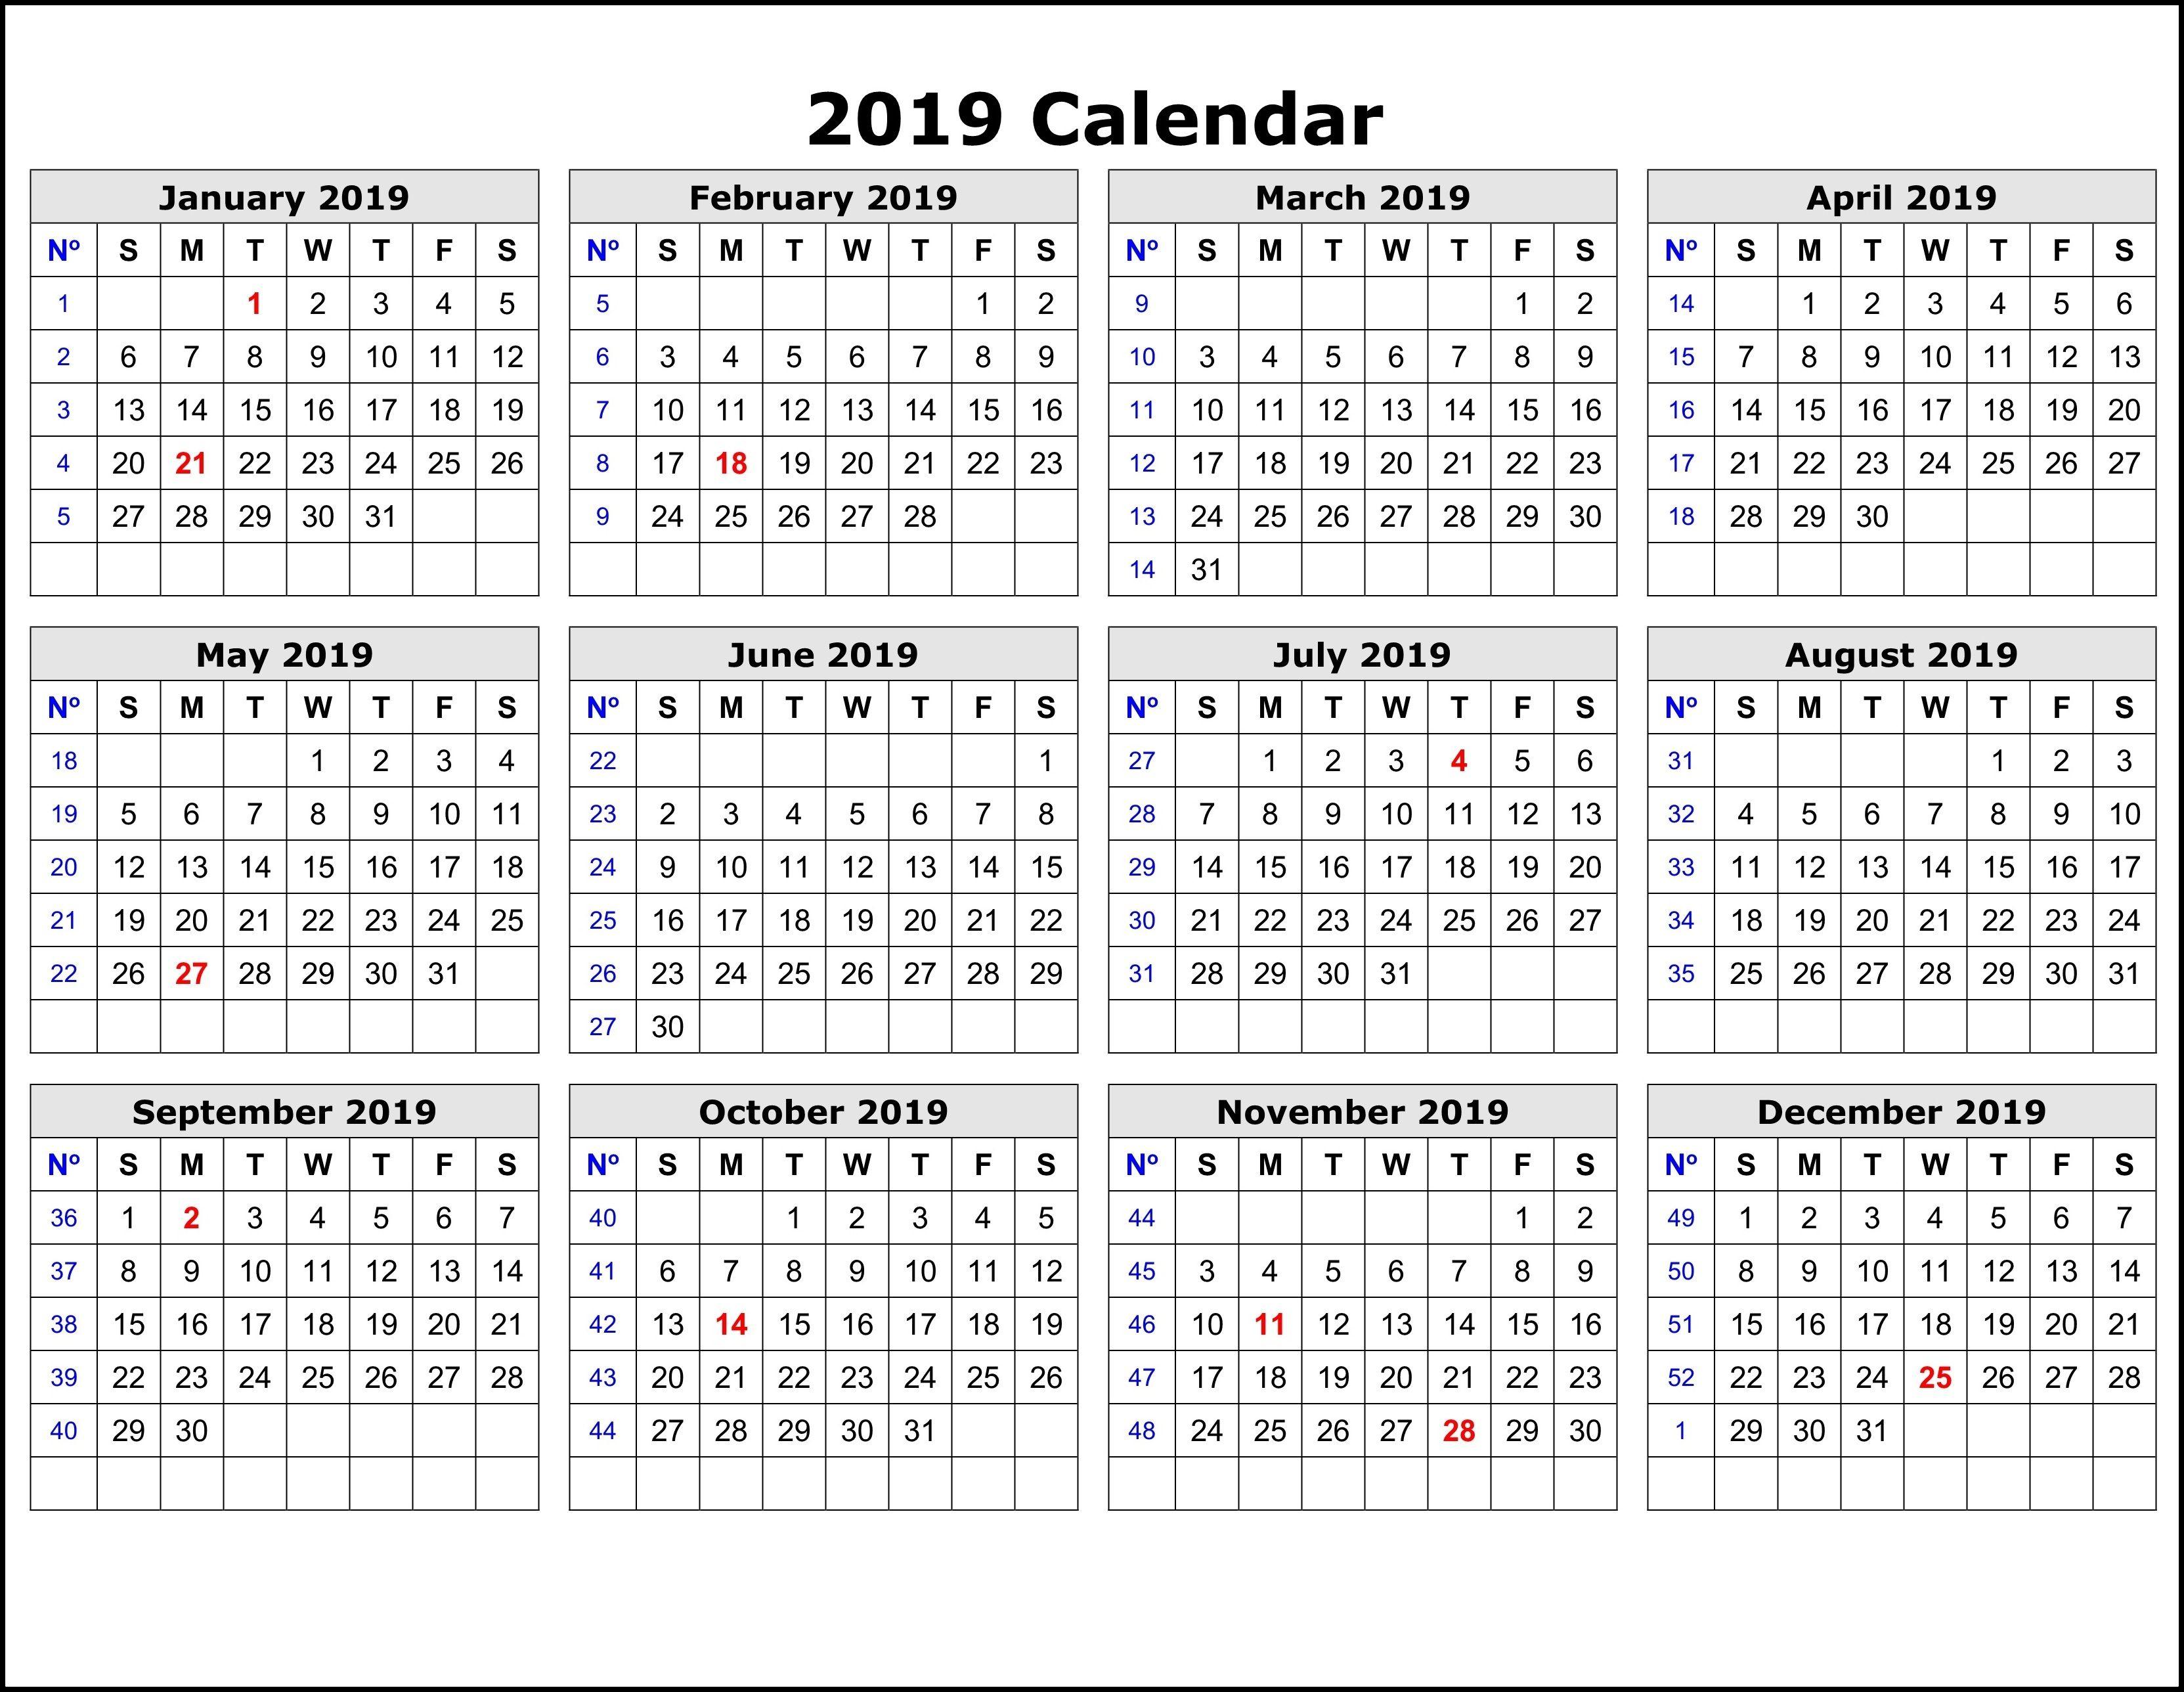 2019 Calendar Templateweek | 2019 Calendar Template In